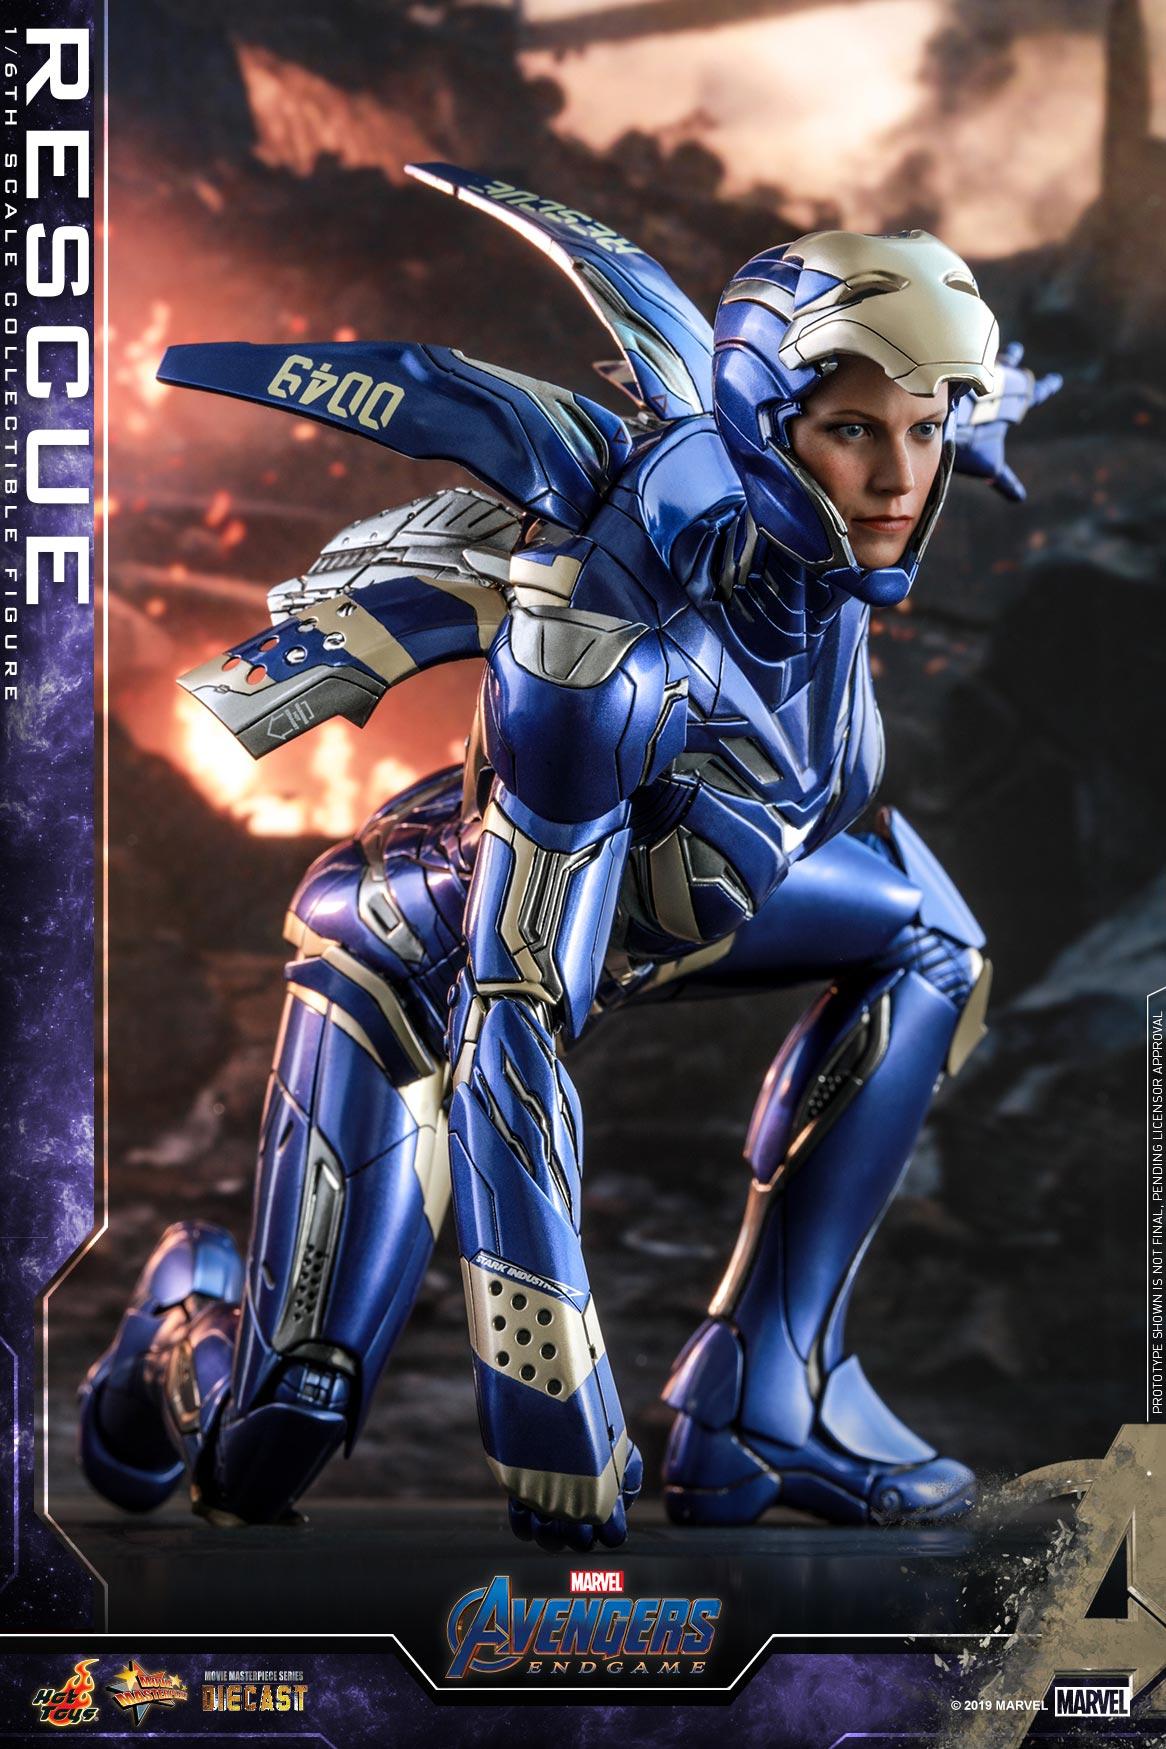 Hot-Toys---Avengers-4---Rescue-collectible-figure_PR1